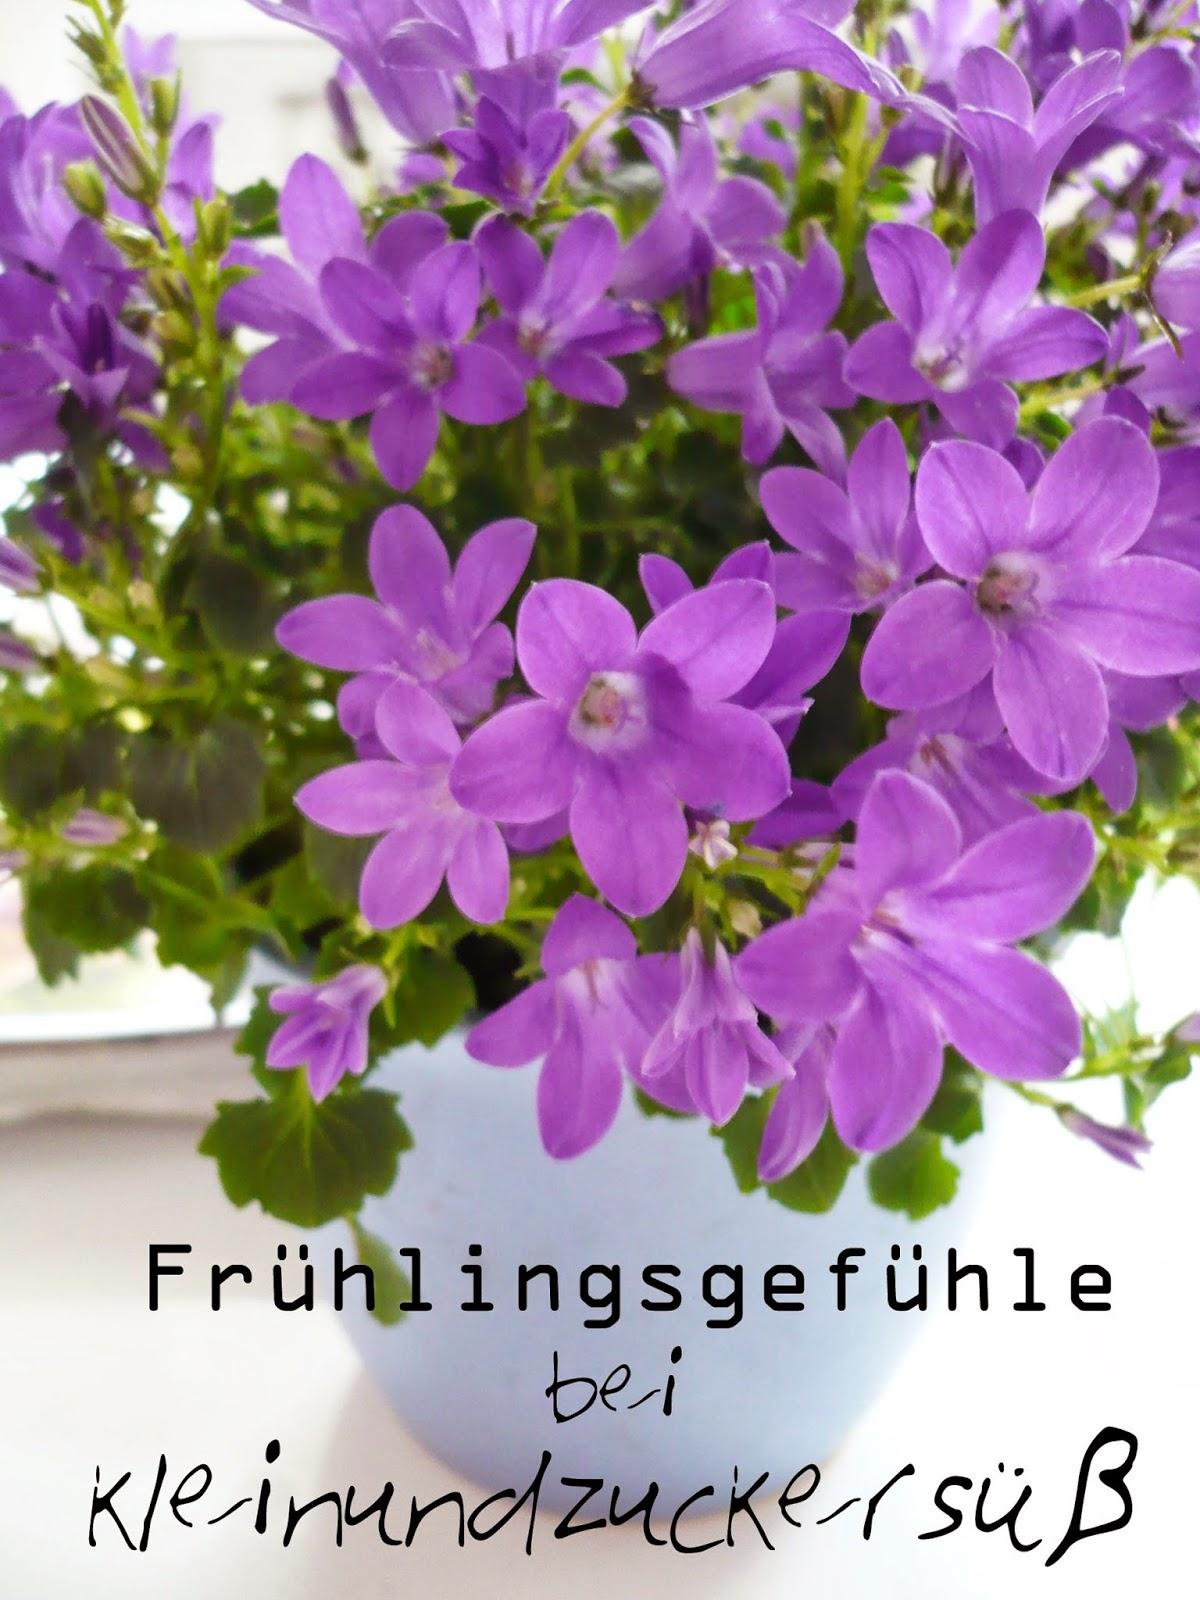 Frühlingsgefühle: Lasst uns gemeinsam backen!